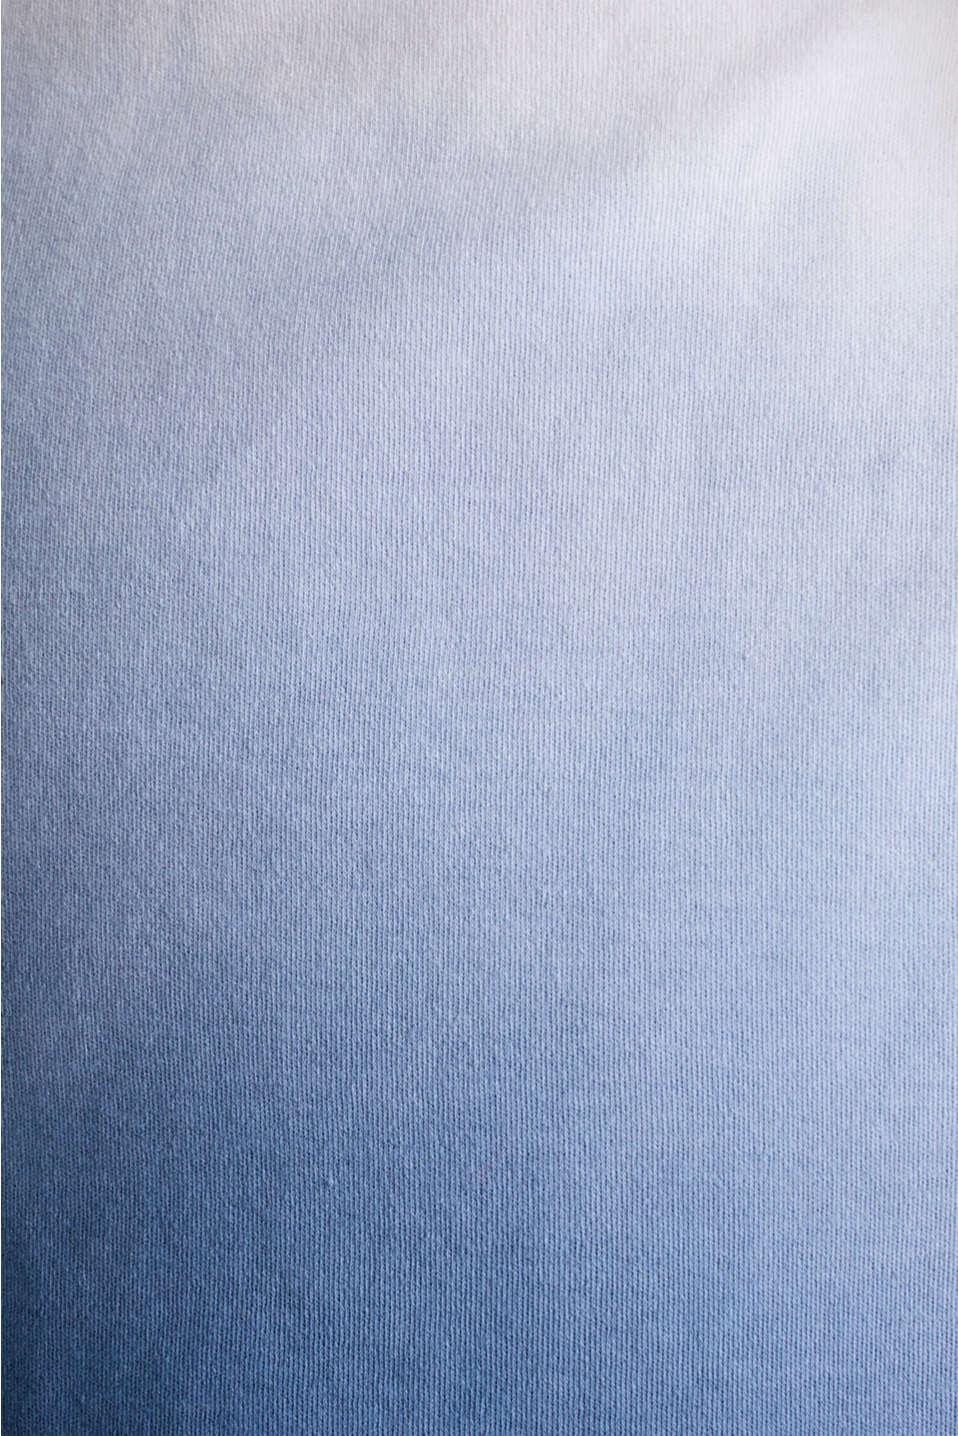 Jersey shorts, 100% cotton, BLUE LAVENDER, detail image number 4